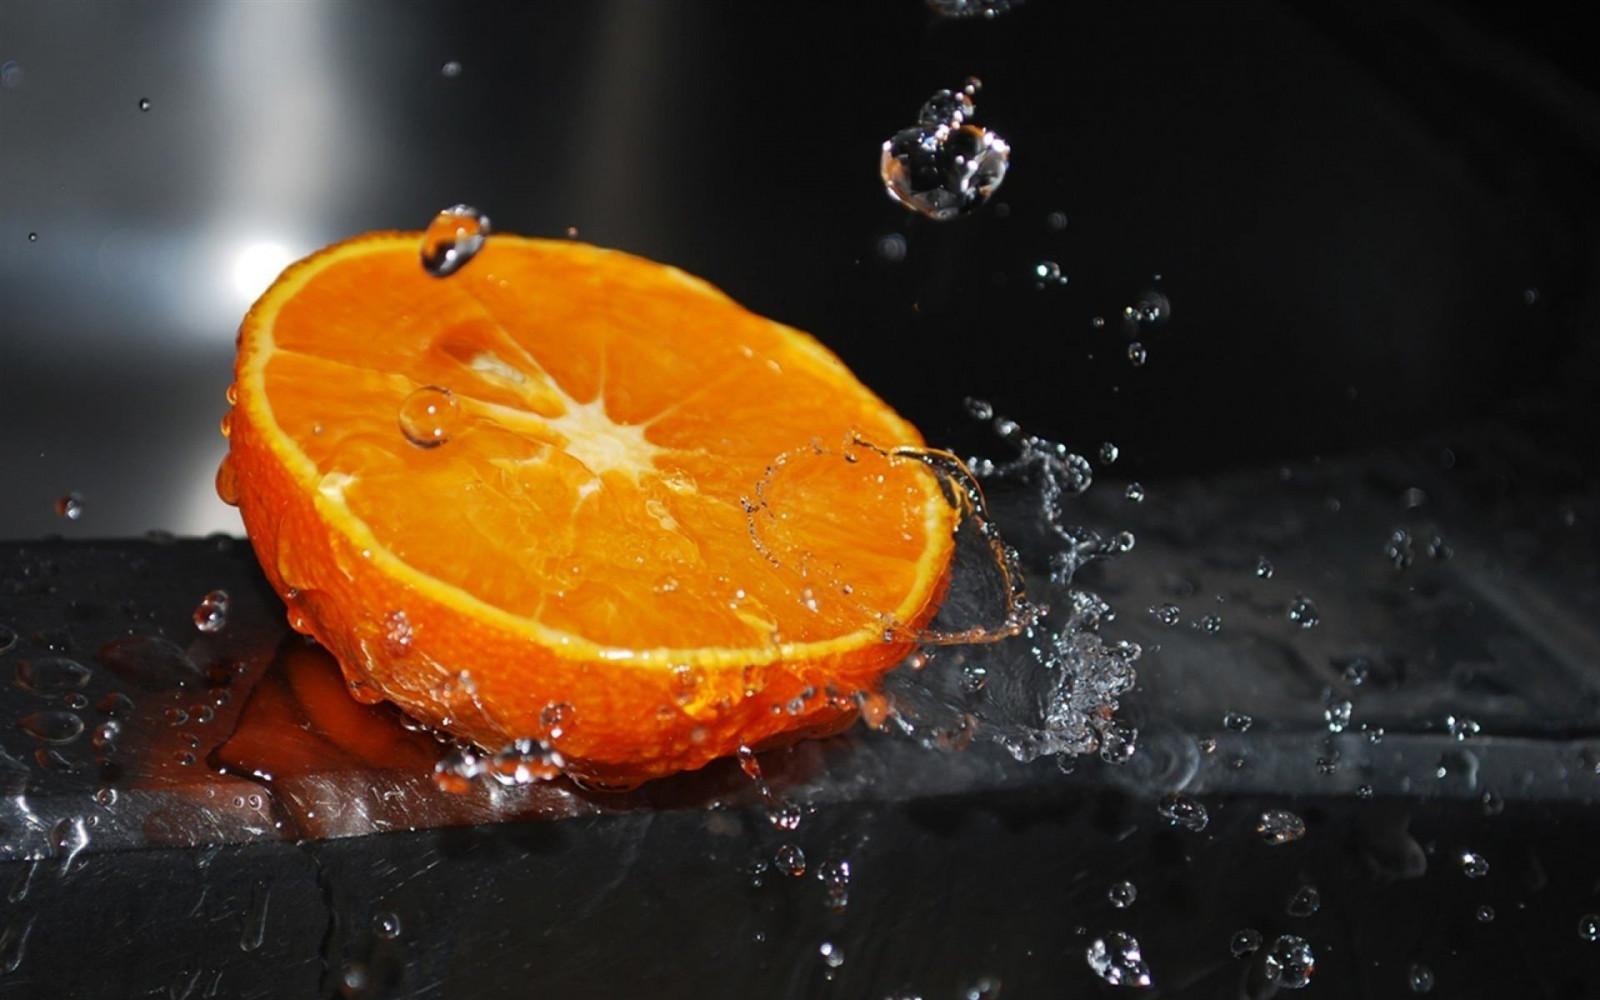 1920x1200 px, ART, beauty, black, citrus, drops, fresh, macro, orange, photographer, splash, splashing, wallpaper, water